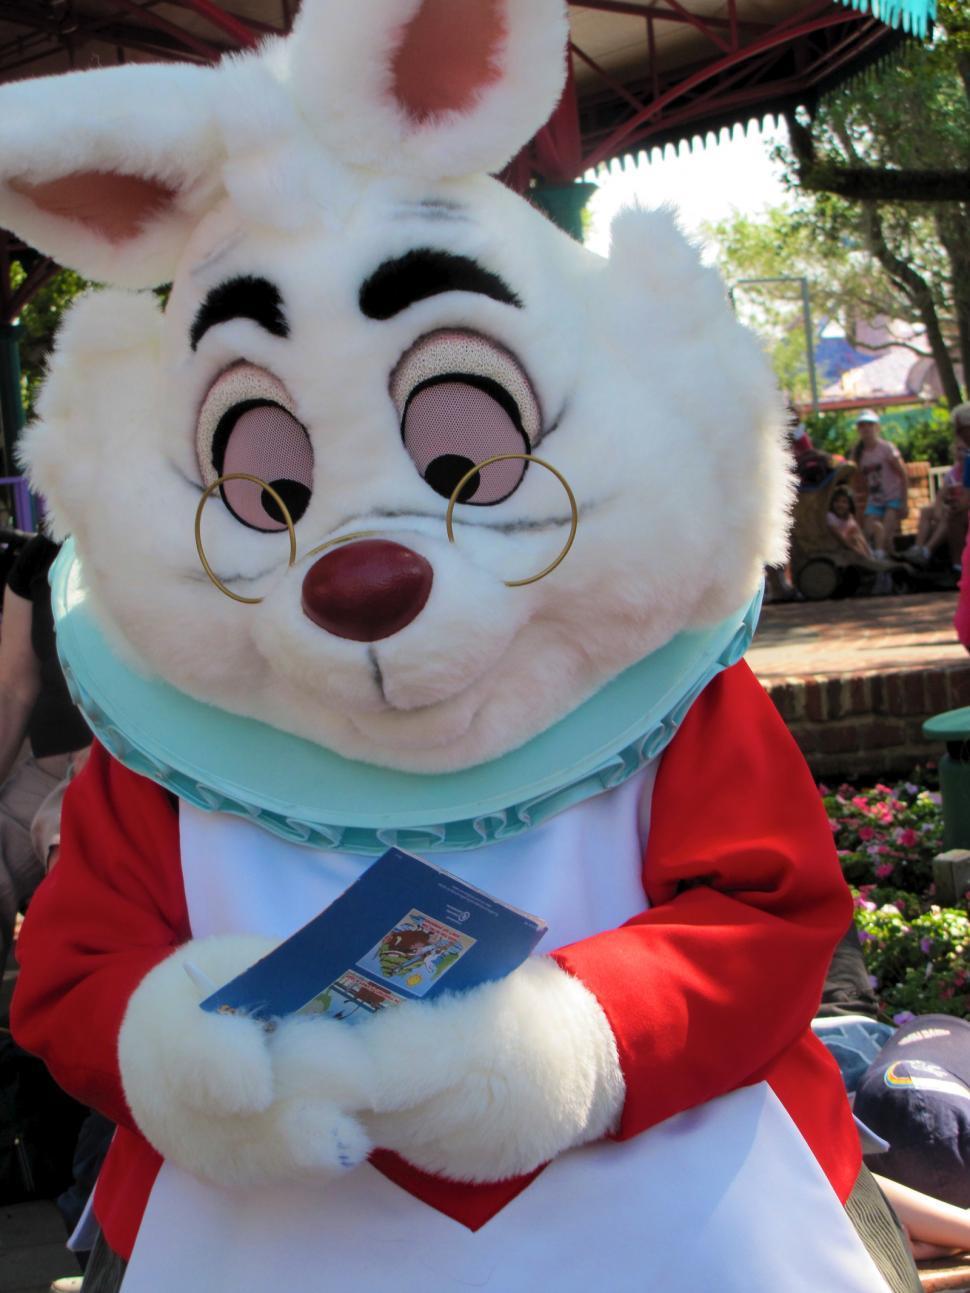 Download Free Stock HD Photo of Alice in Wonderland Rabbit Online